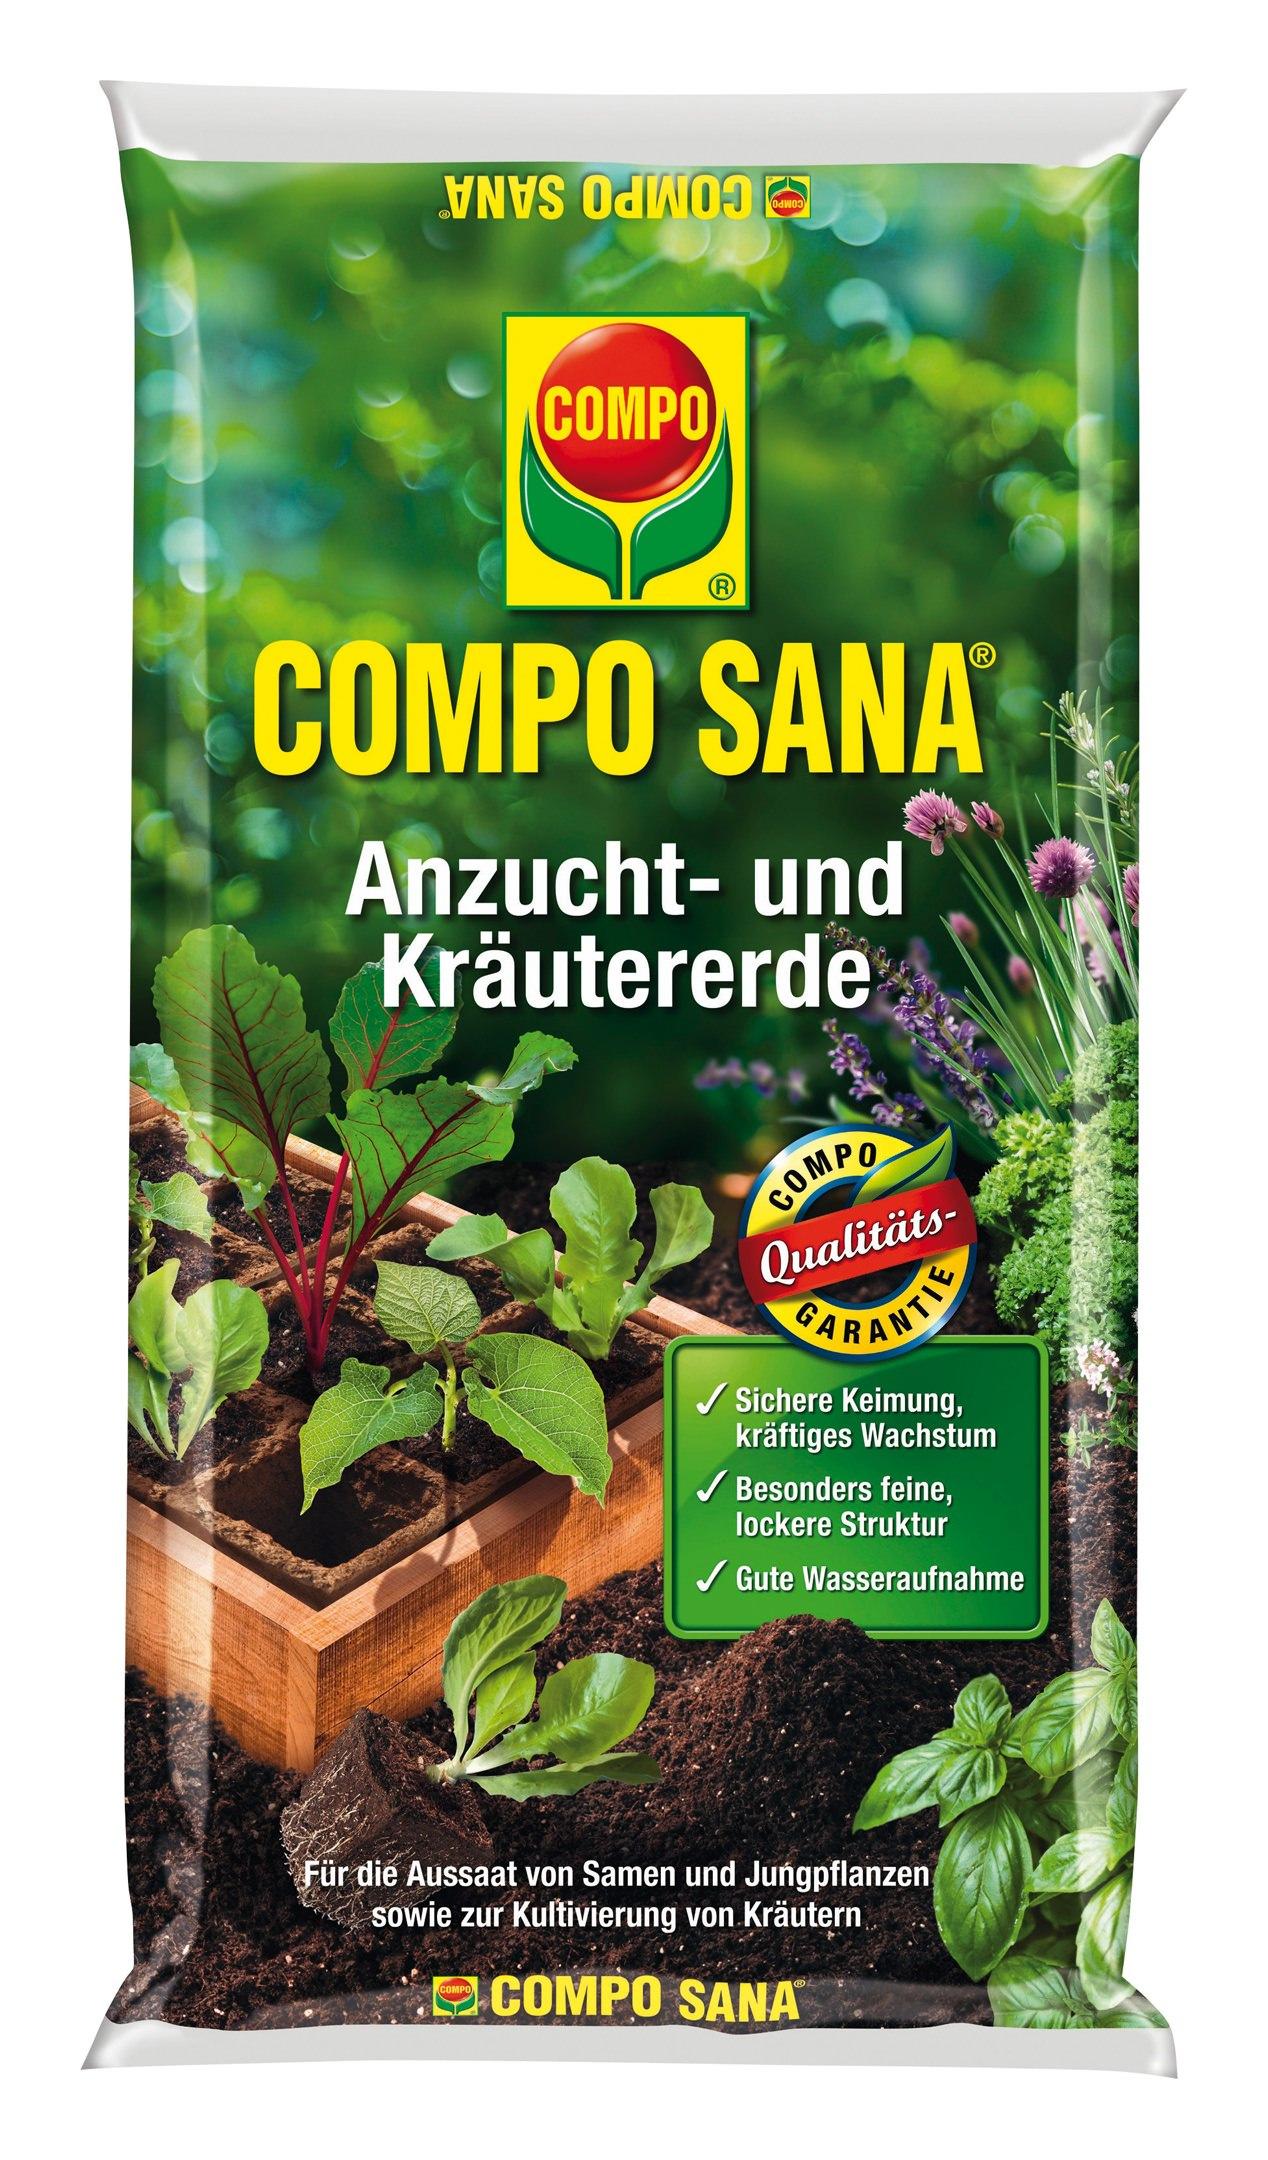 Compo Sana Anzucht- und Kräutererde 20 l - 1062804004